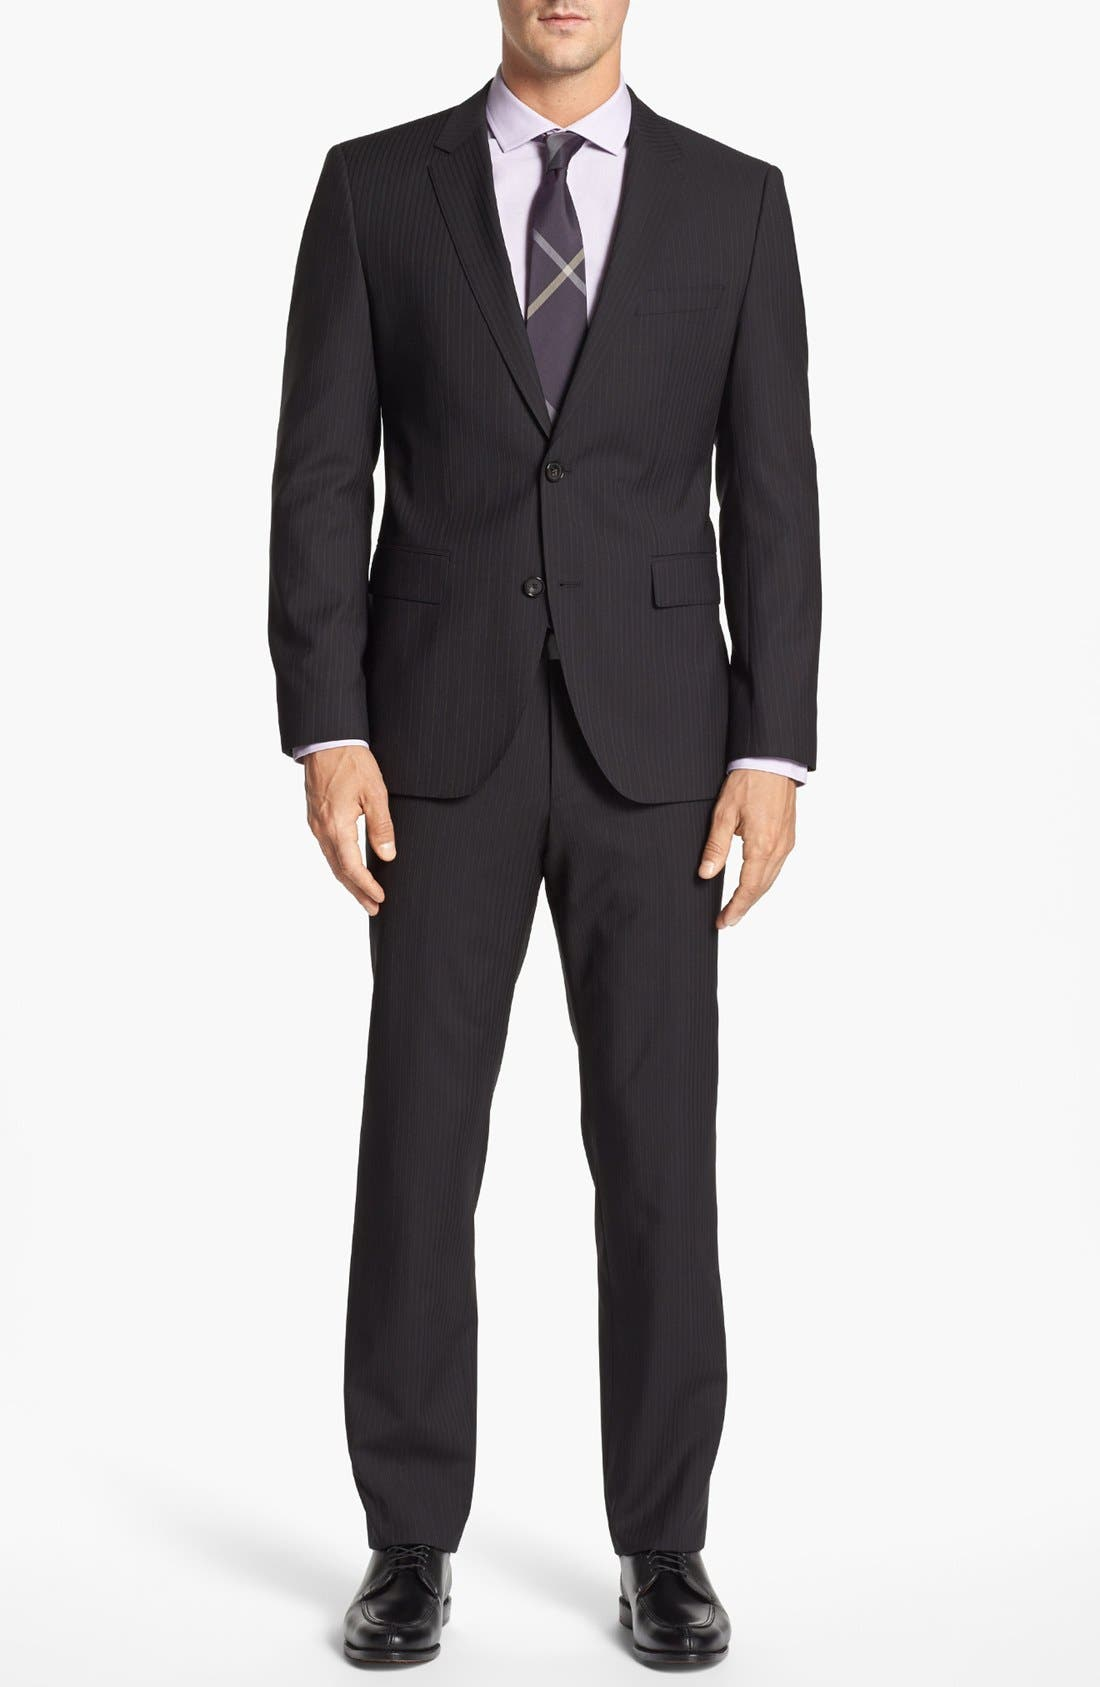 Alternate Image 1 Selected - BOSS Black 'James/Sharp' Trim Fit Stripe Suit (Online Only)